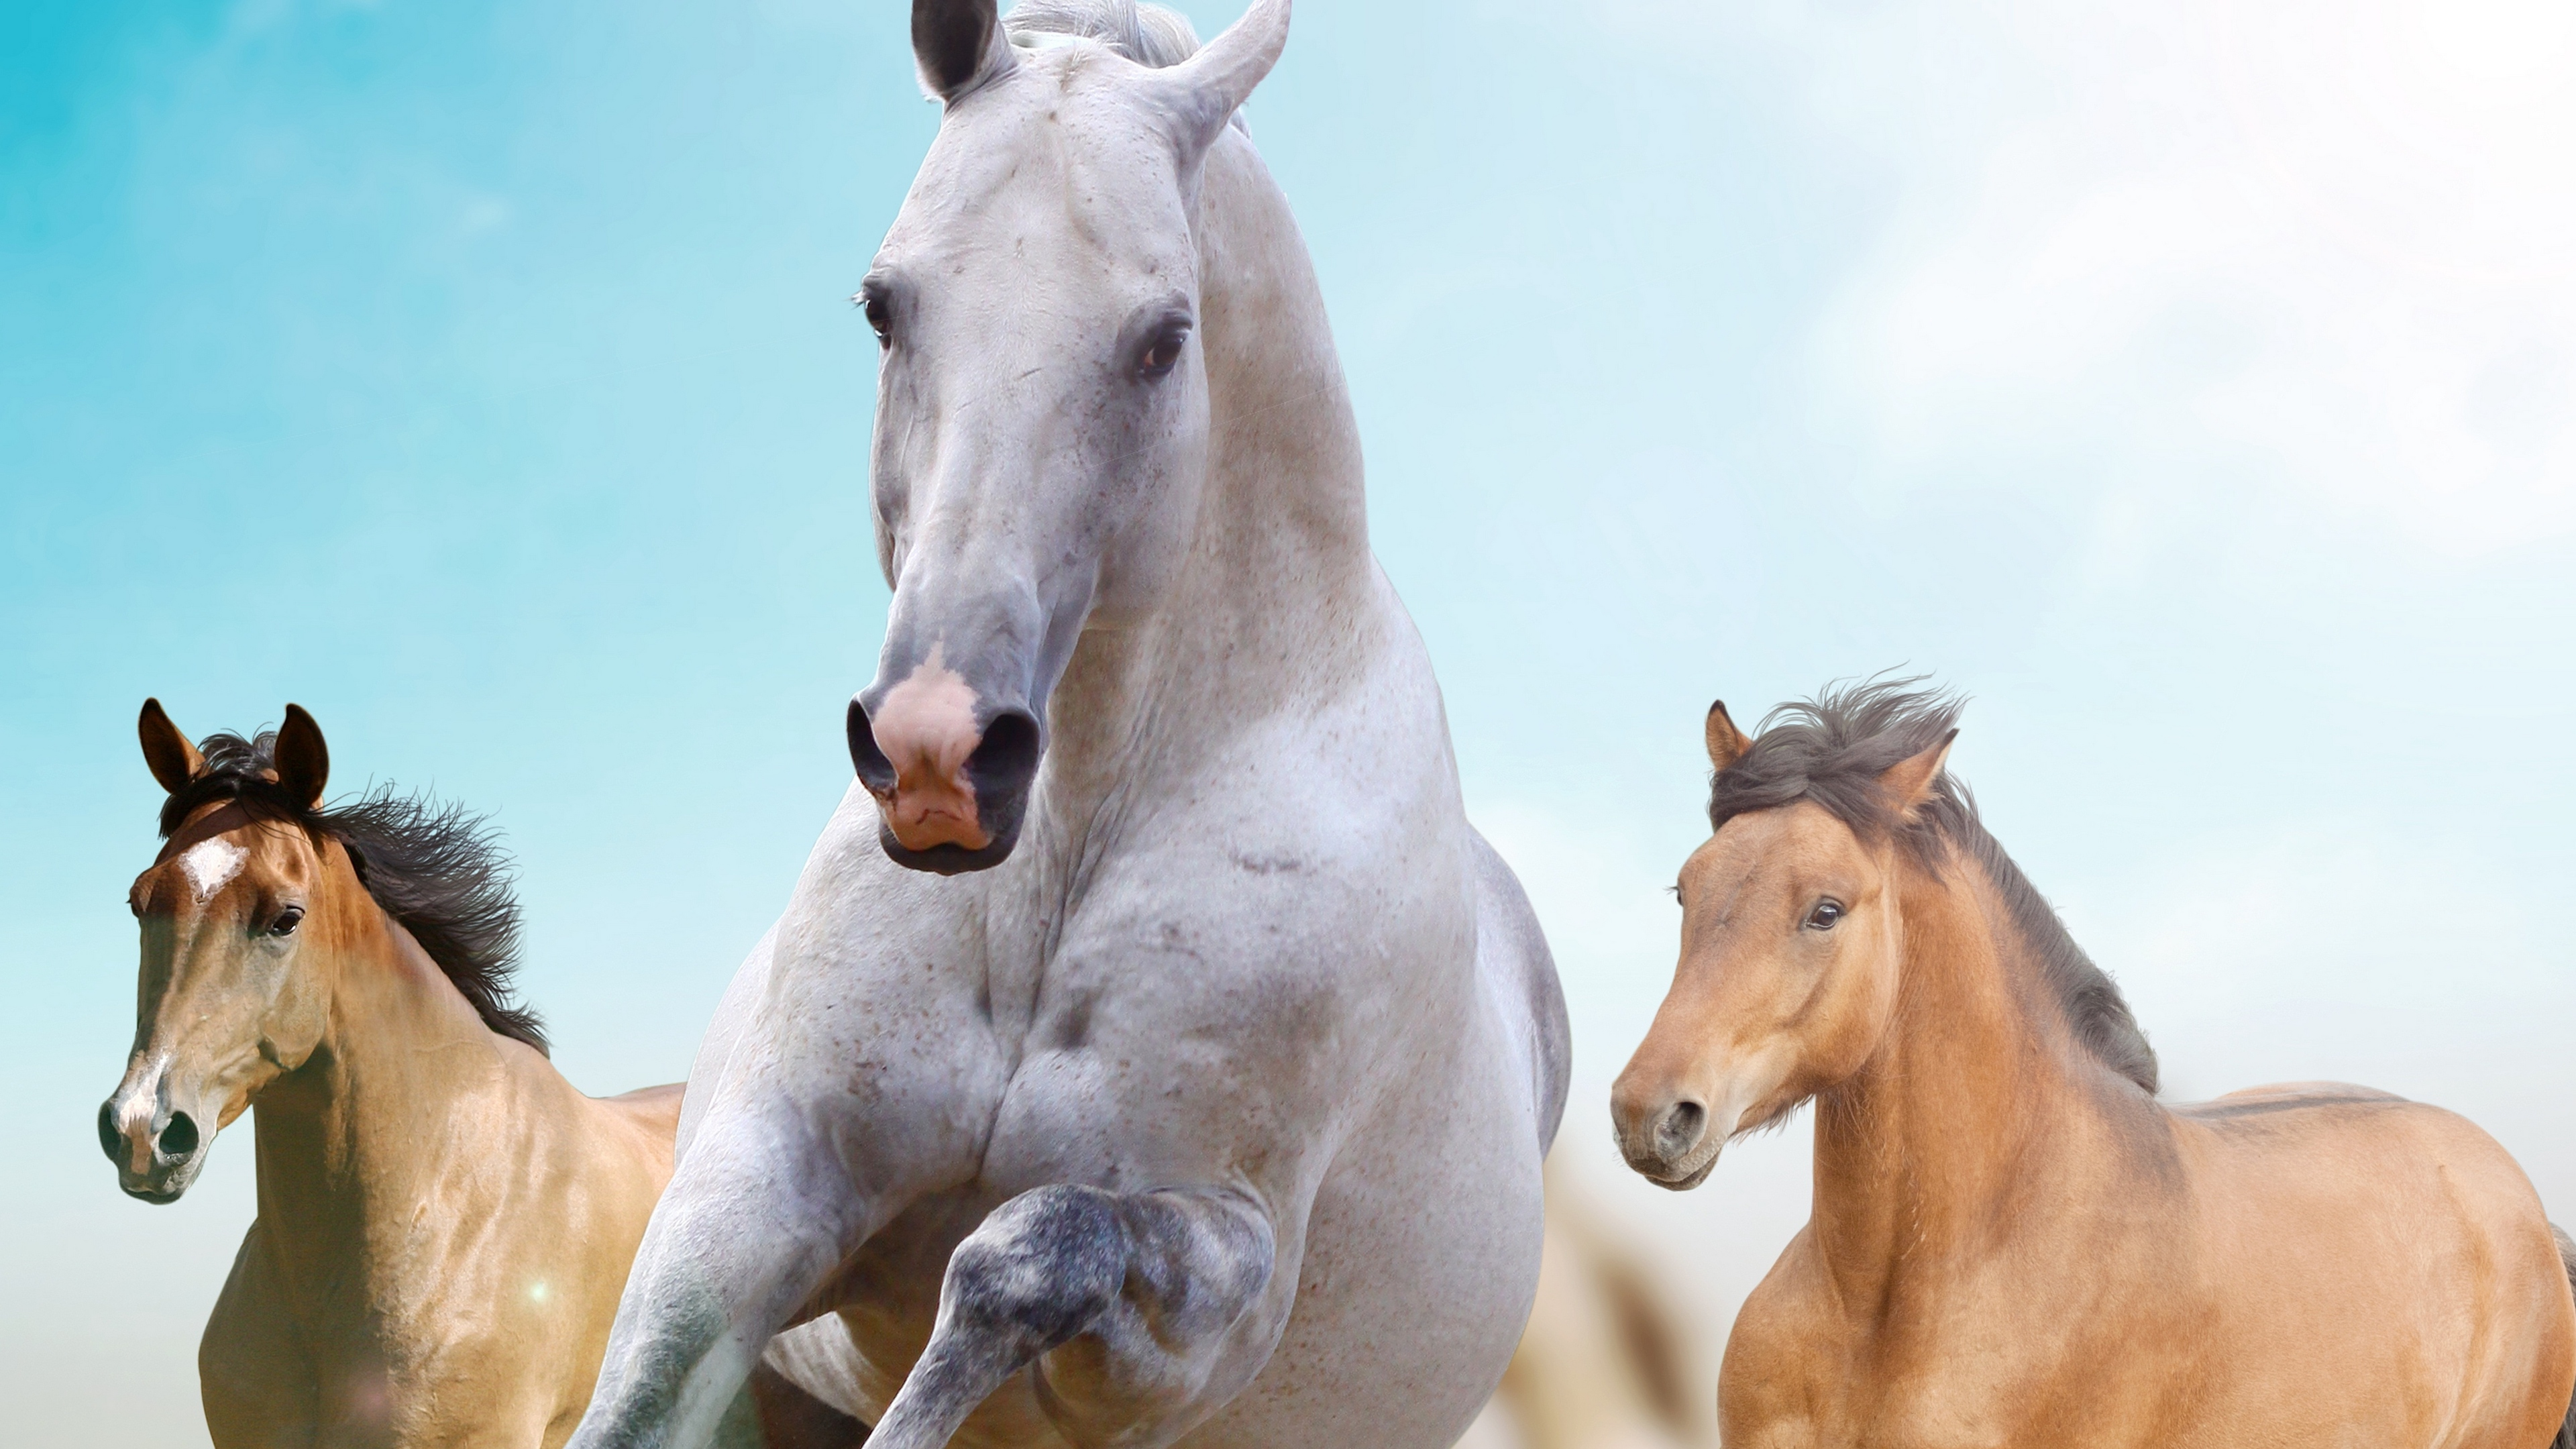 horses running freedom 4k 1542242249 - horses, running, freedom 4k - Running, Horses, Freedom